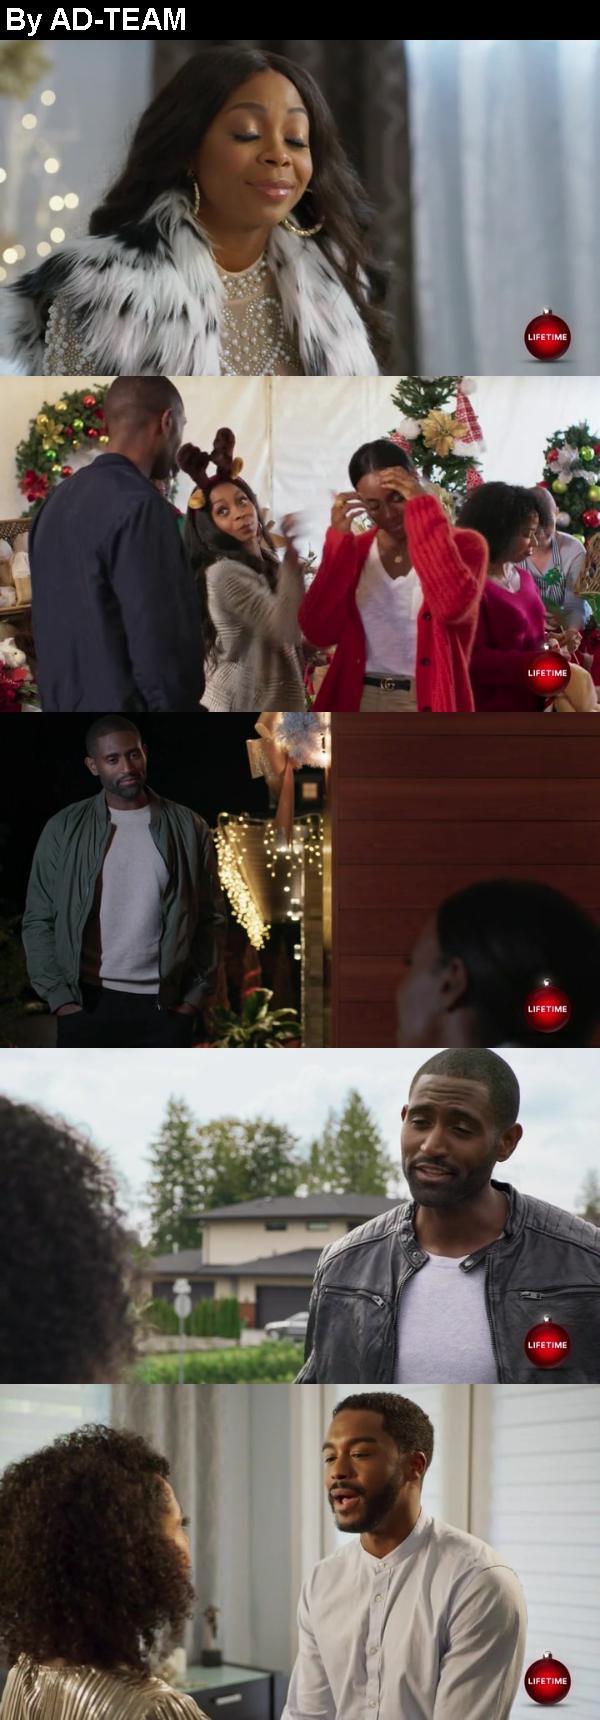 Merry Liddle Christmas 2019 HDTV x264-CRiMSON